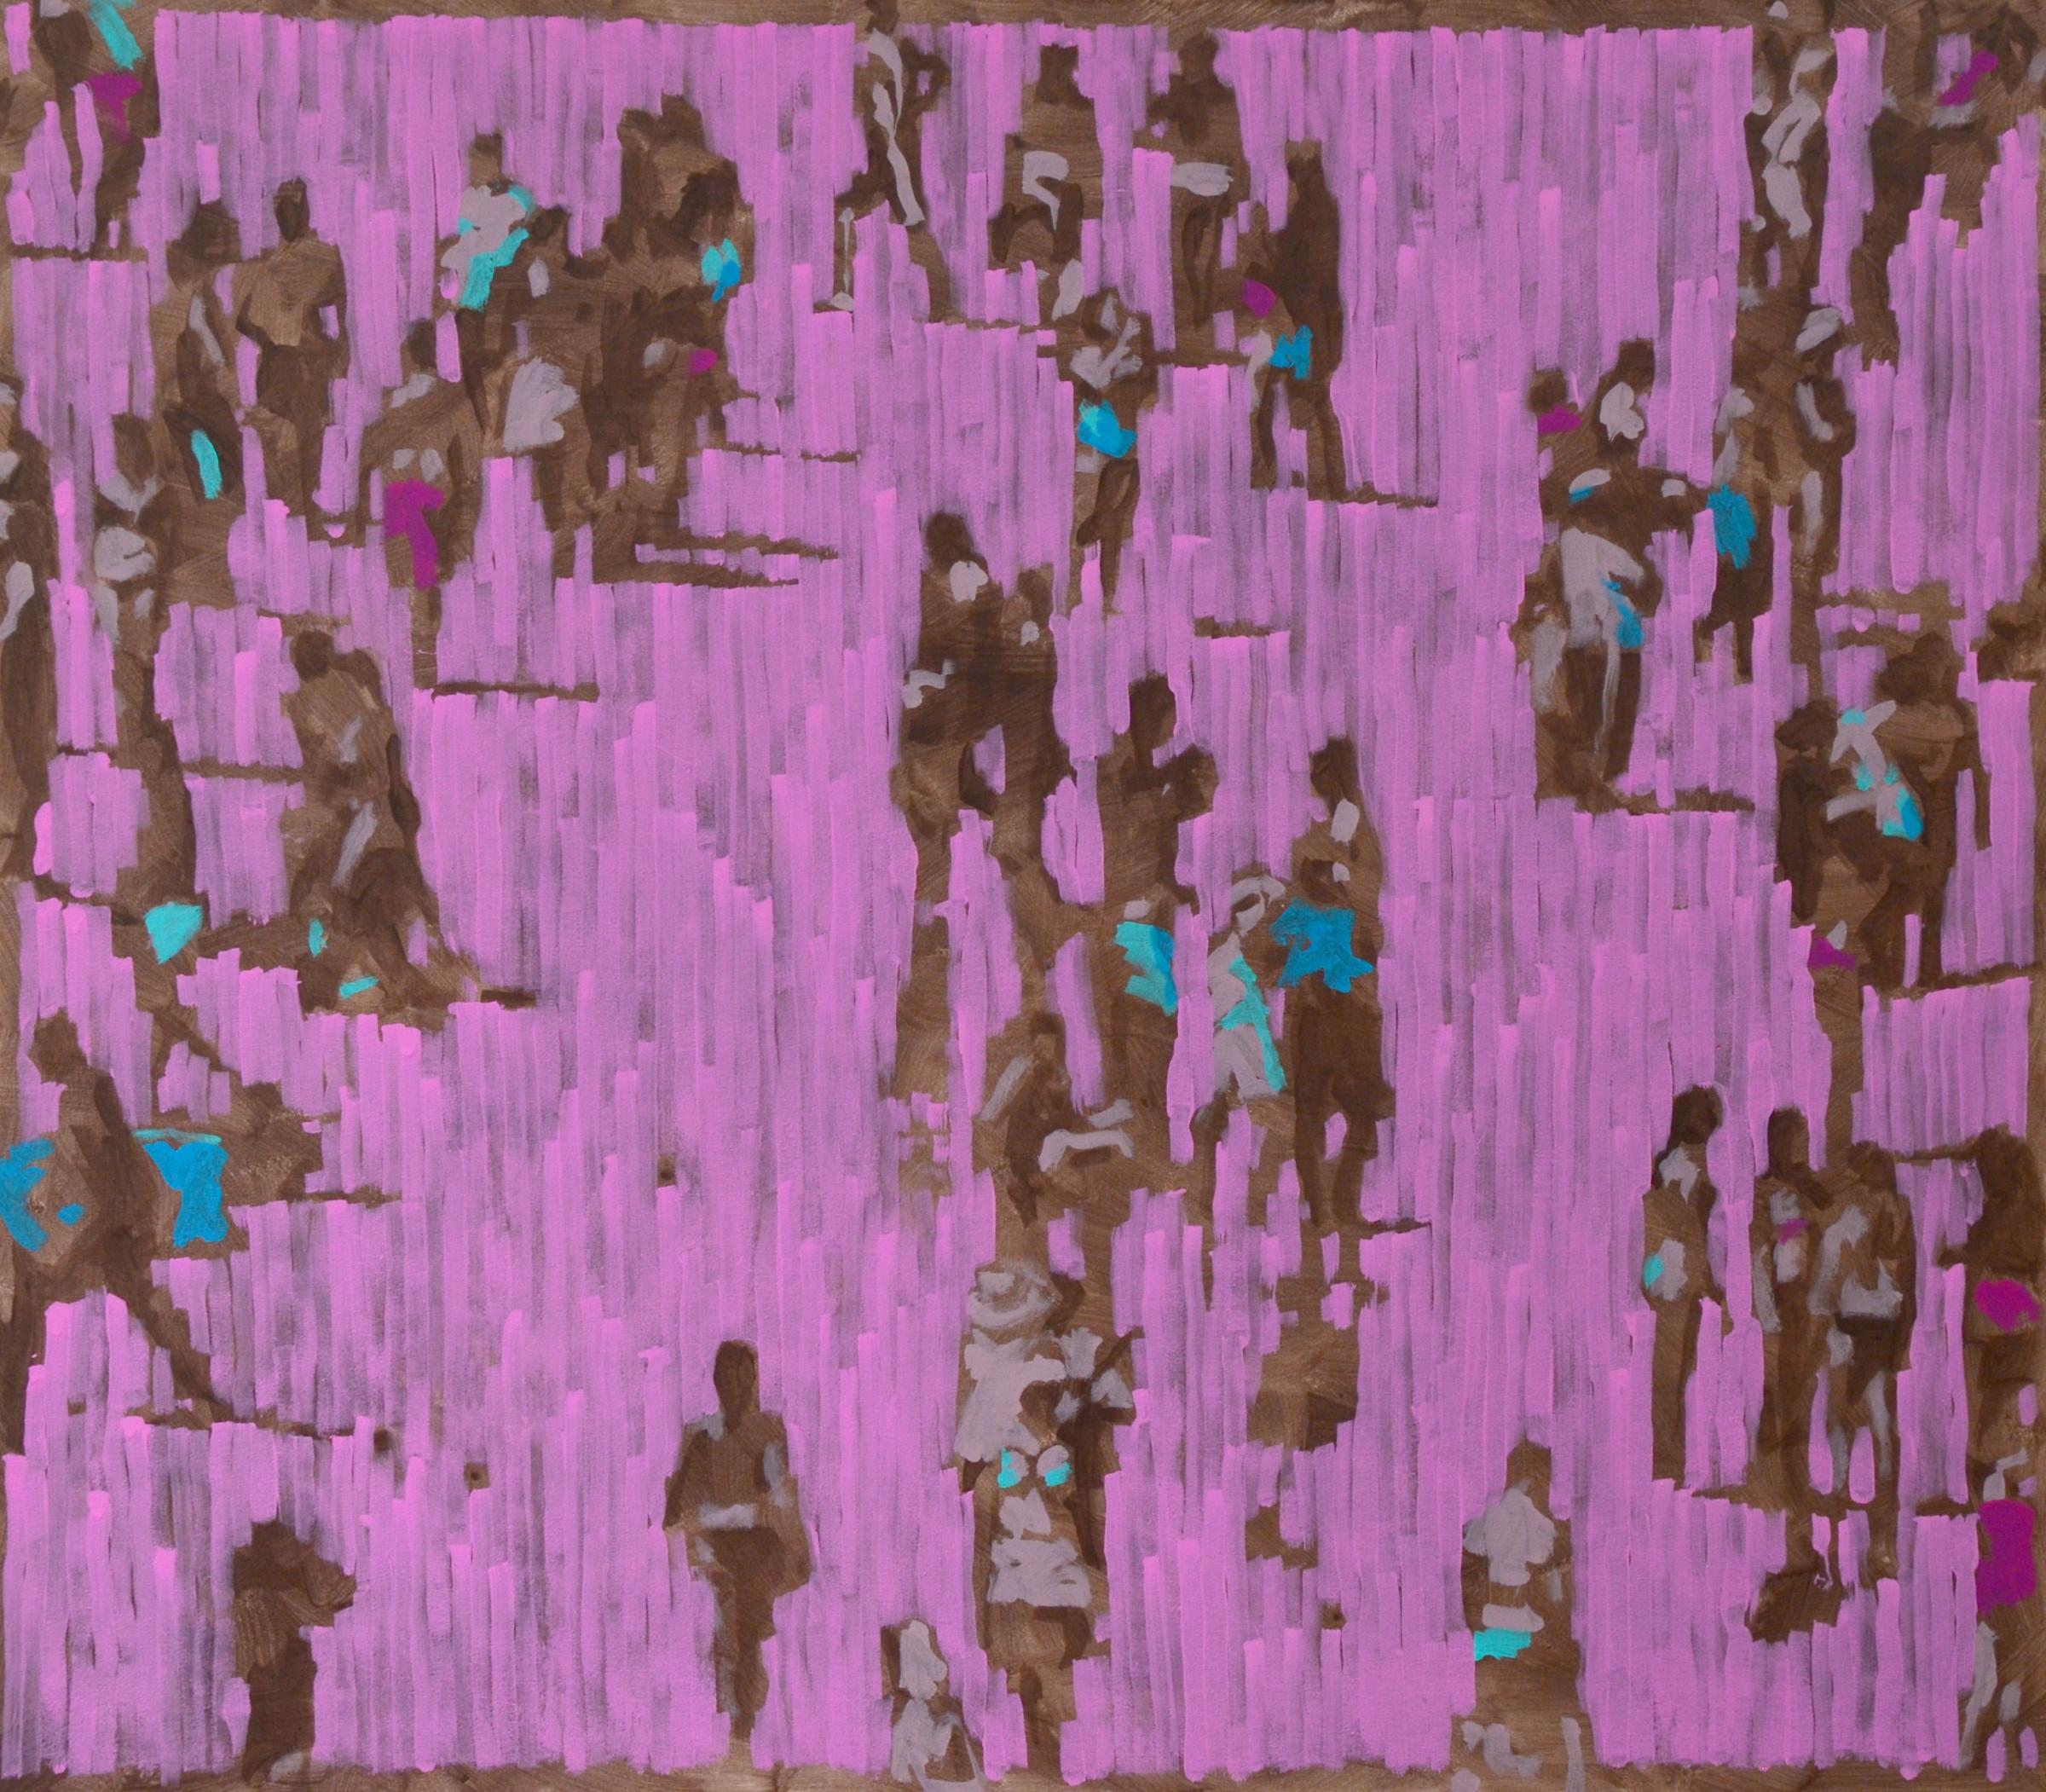 "<span class=""link fancybox-details-link""><a href=""/artists/42-nick-bodimeade/works/5859-nick-bodimeade-magenta-beach-2018/"">View Detail Page</a></span><div class=""artist""><strong>Nick Bodimeade</strong></div> <div class=""title""><em>Magenta Beach</em>, 2018</div> <div class=""signed_and_dated"">signed, titled and dated on reverse</div> <div class=""medium"">oil on canvas</div> <div class=""dimensions"">105 x 120 cm<br /> 41 3/8 x 47 1/4 inches</div><div class=""price"">£4,400.00</div><div class=""copyright_line"">OwnArt: £ 250 x 10 Months, 0% APR + £ 1,900 deposit</div>"